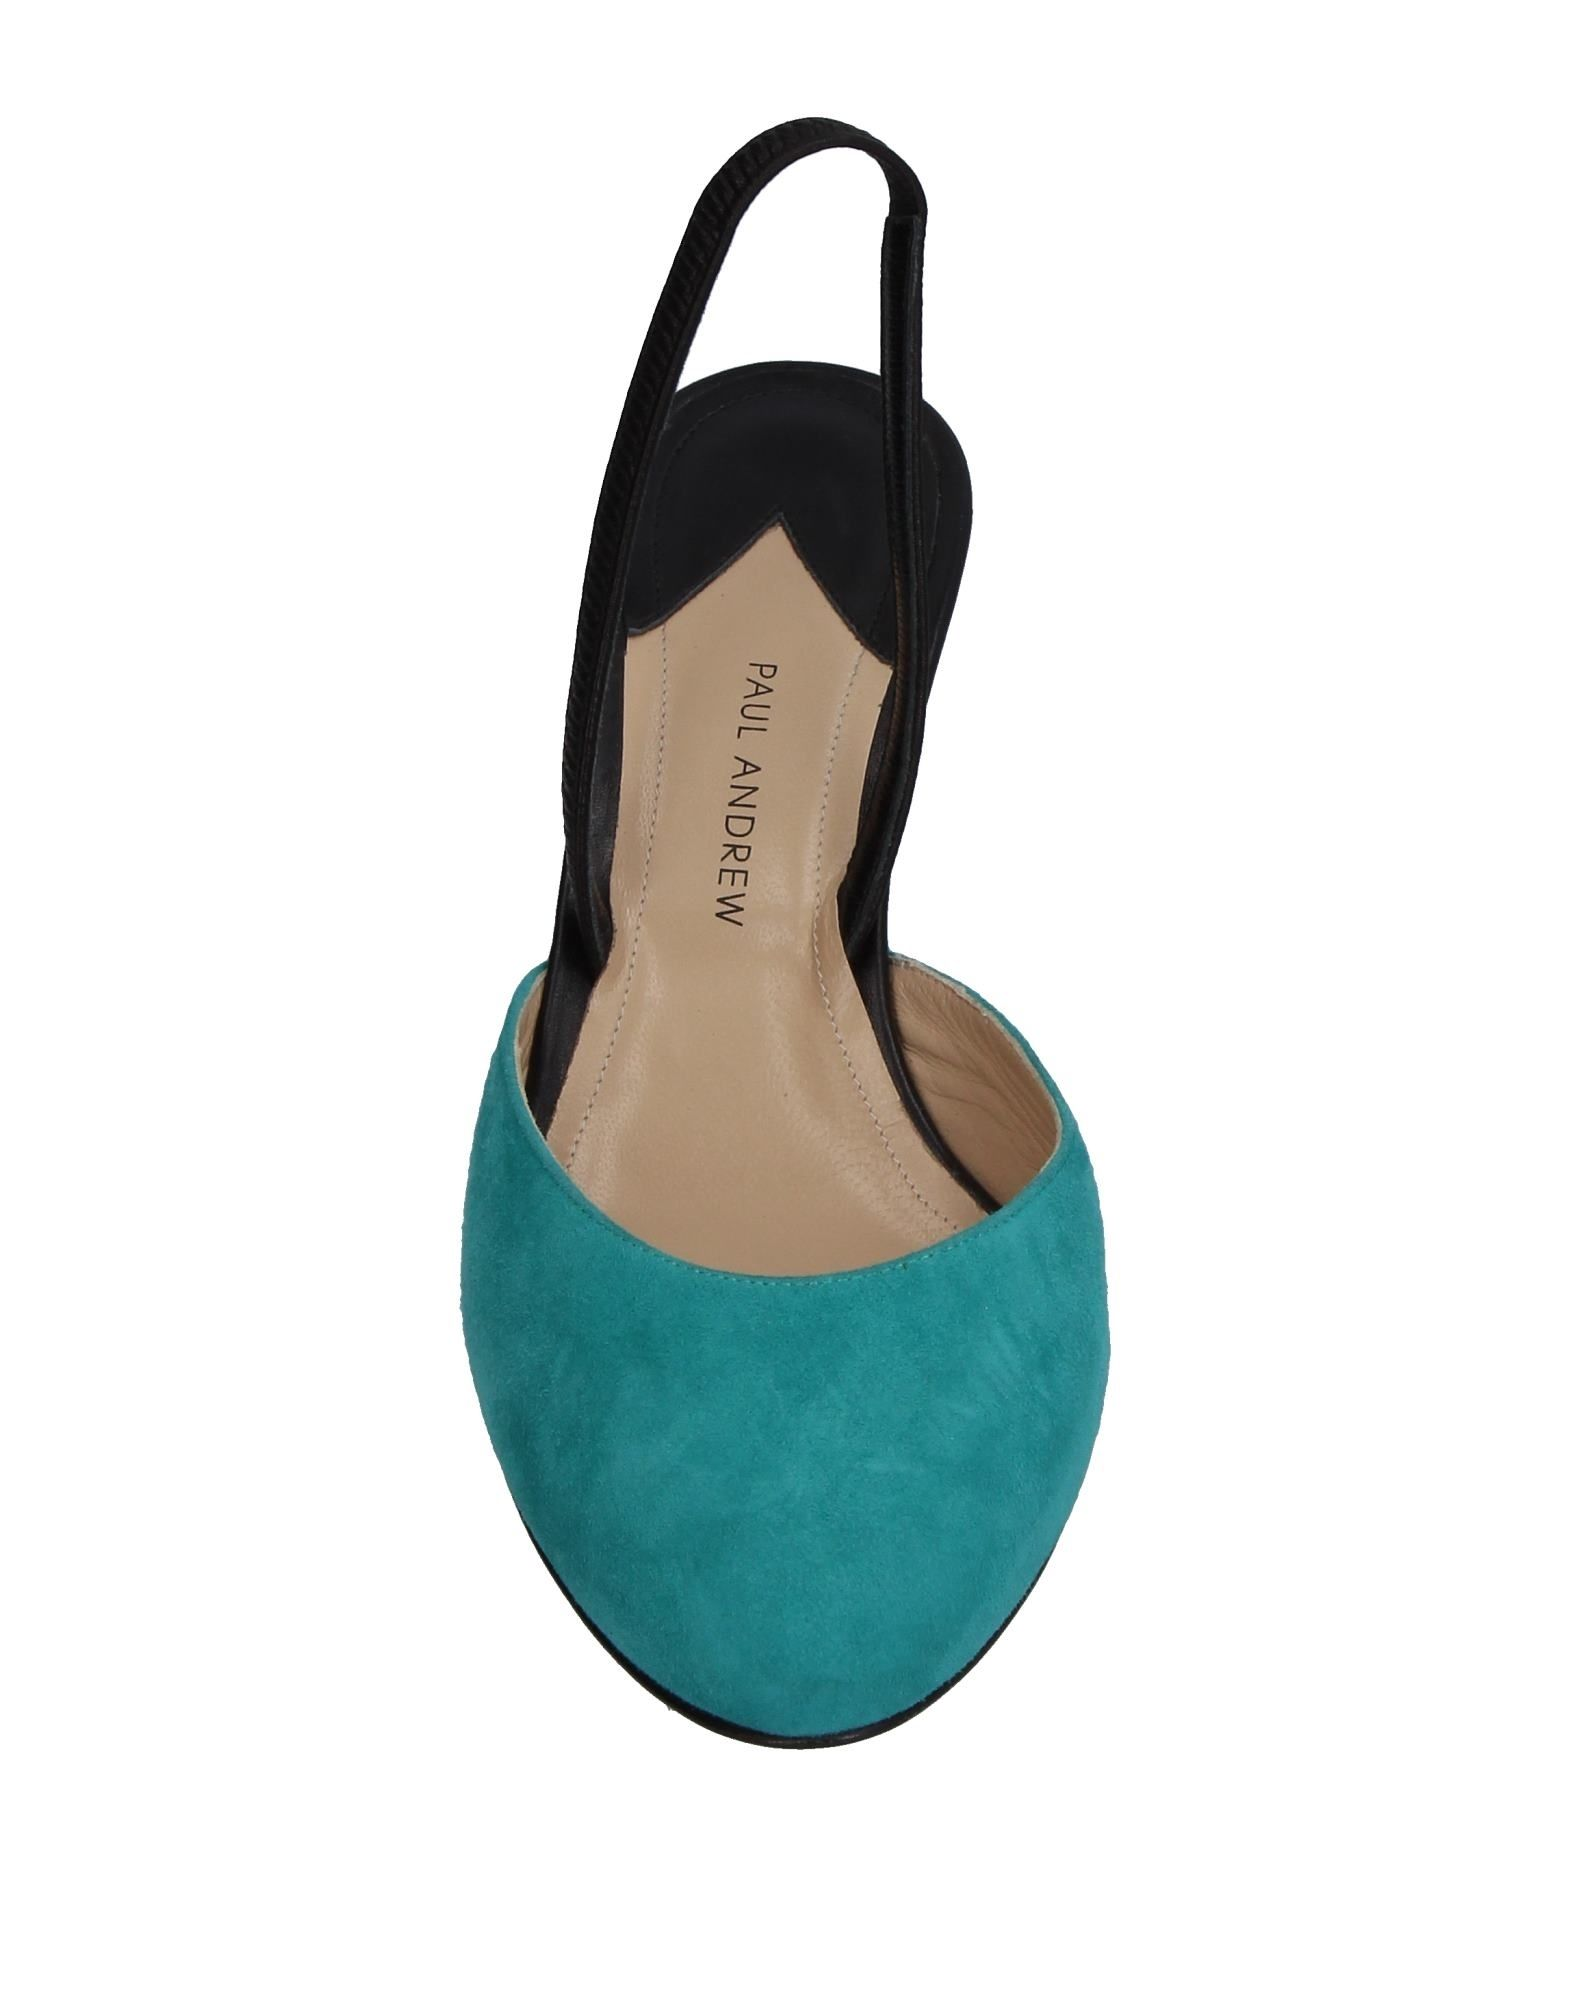 Stilvolle billige Schuhe Damen Paul Andrew Pumps Damen Schuhe  11338142UO 82613a